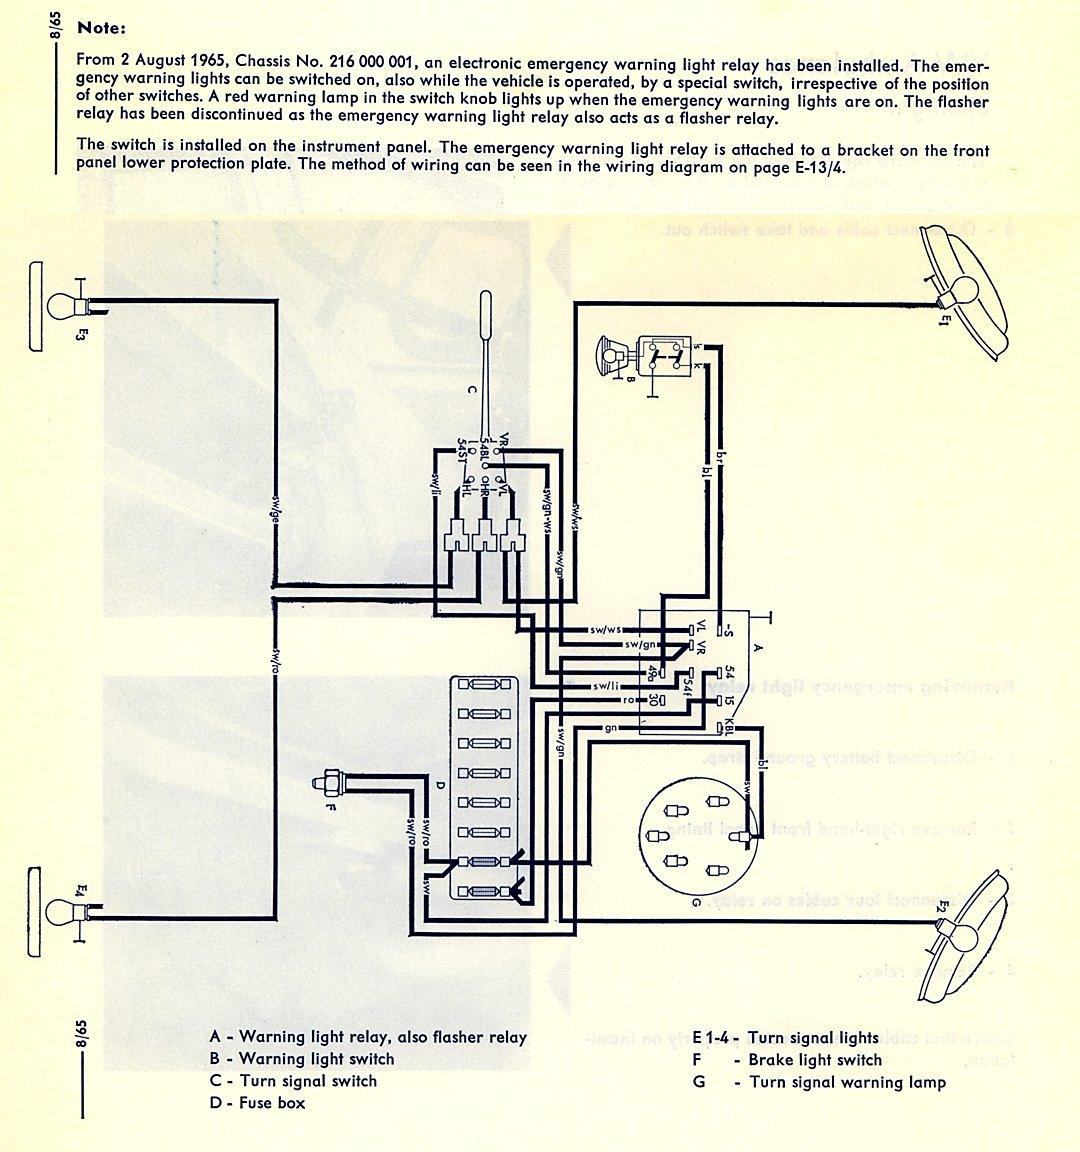 heater blower motor wiring diagram Download-bus emergency lights 8 65 7-e